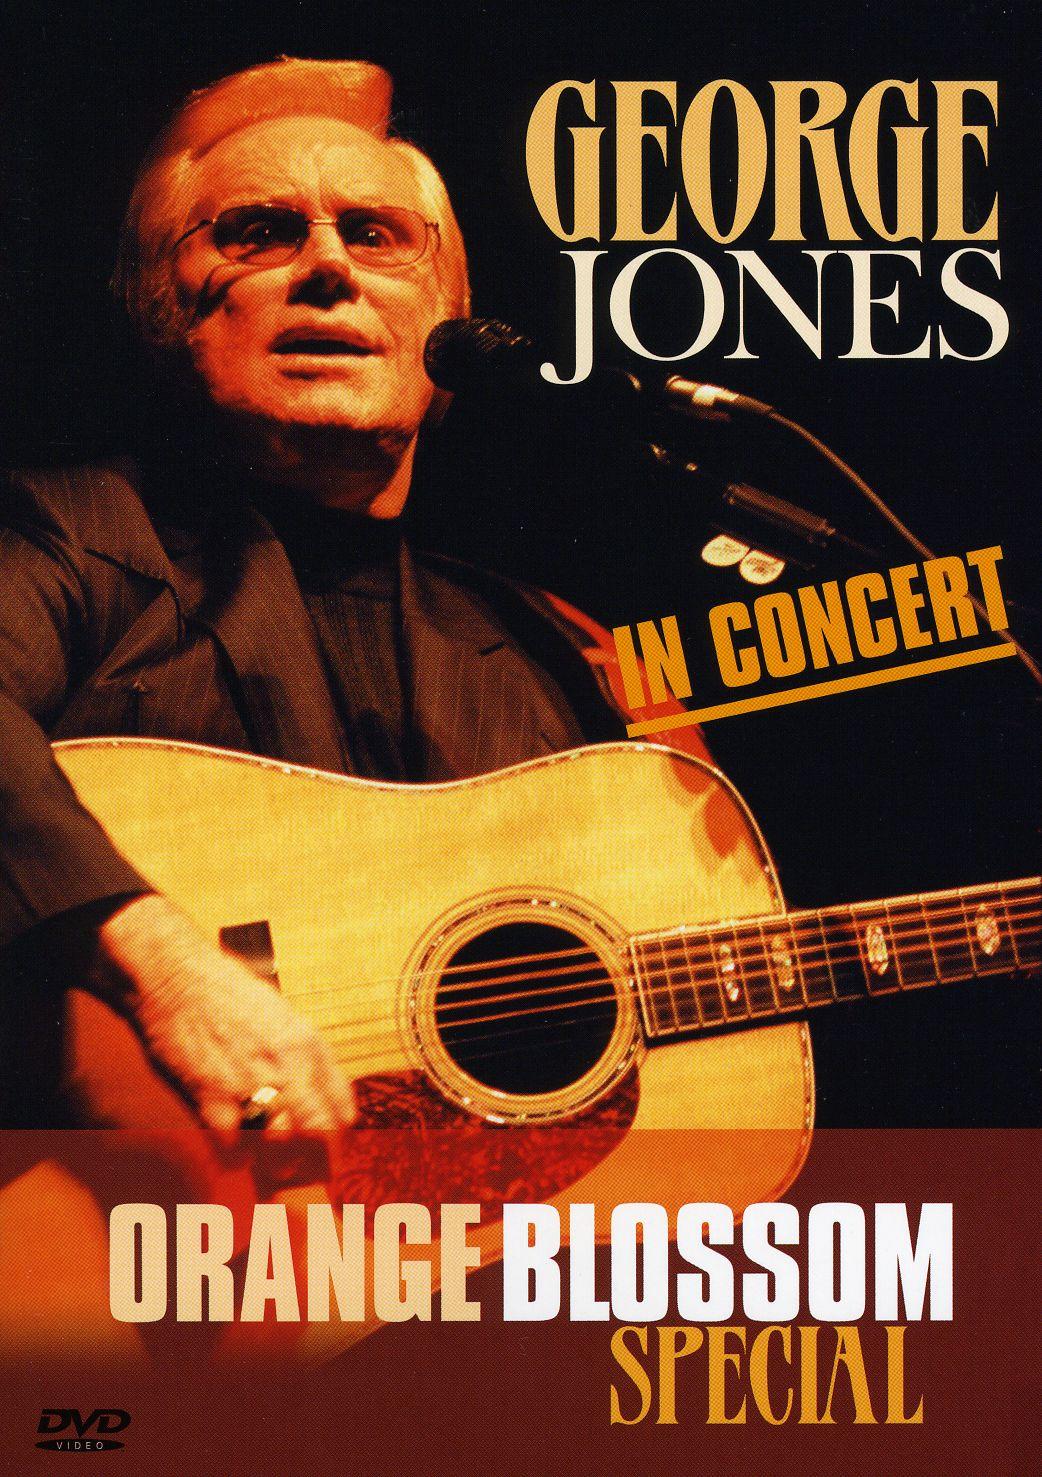 Georges Jones: In Concert - Orange Blossom Special